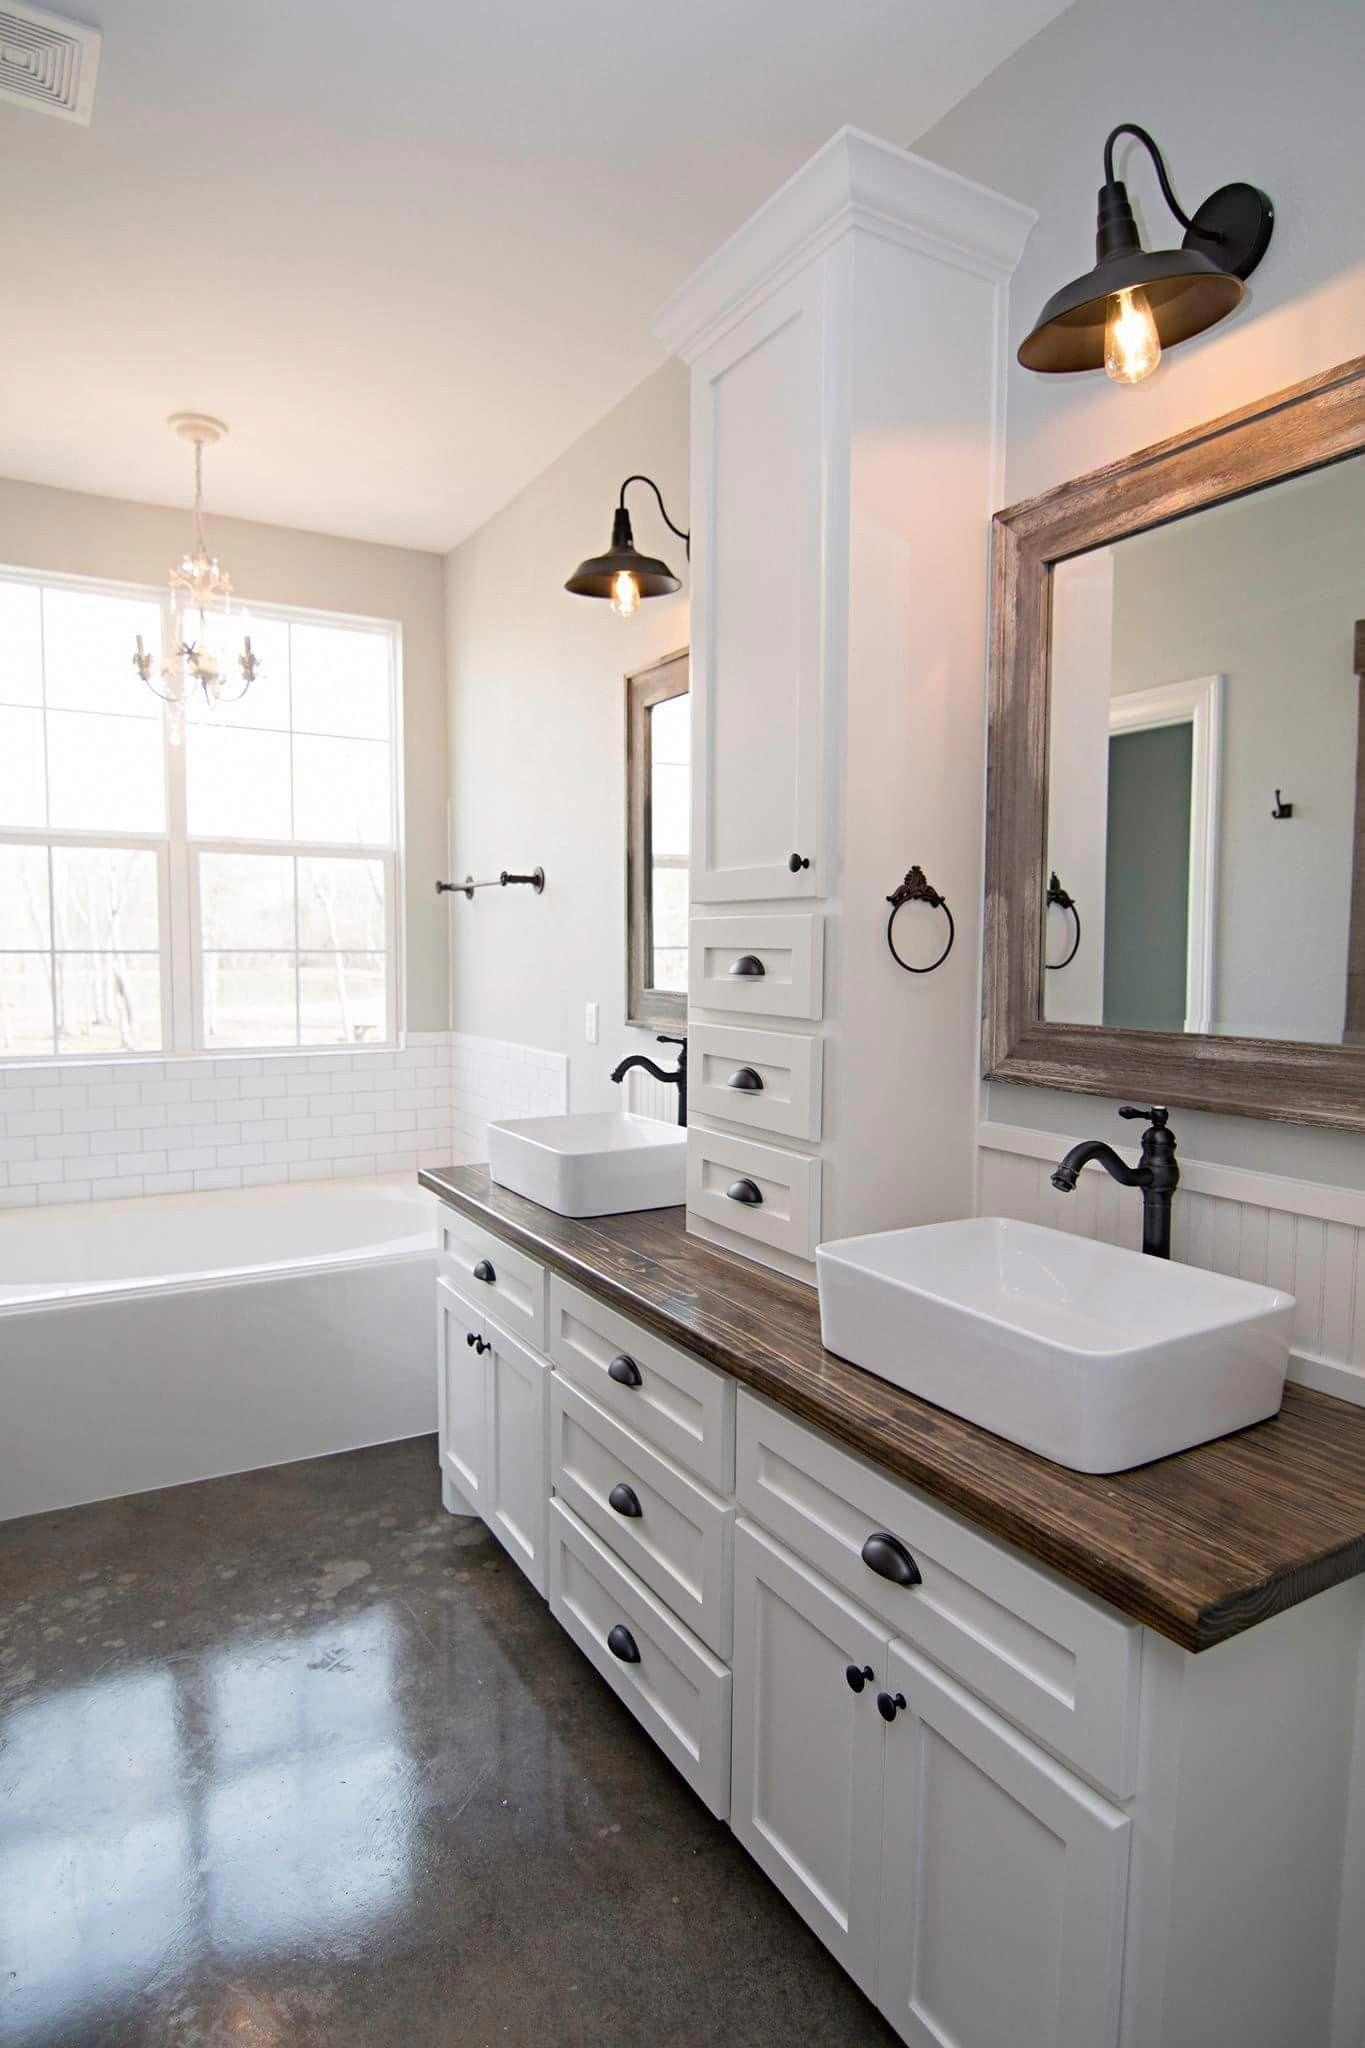 12 brilliant bathroom light fixture ideas bathroom lighting rh pinterest com